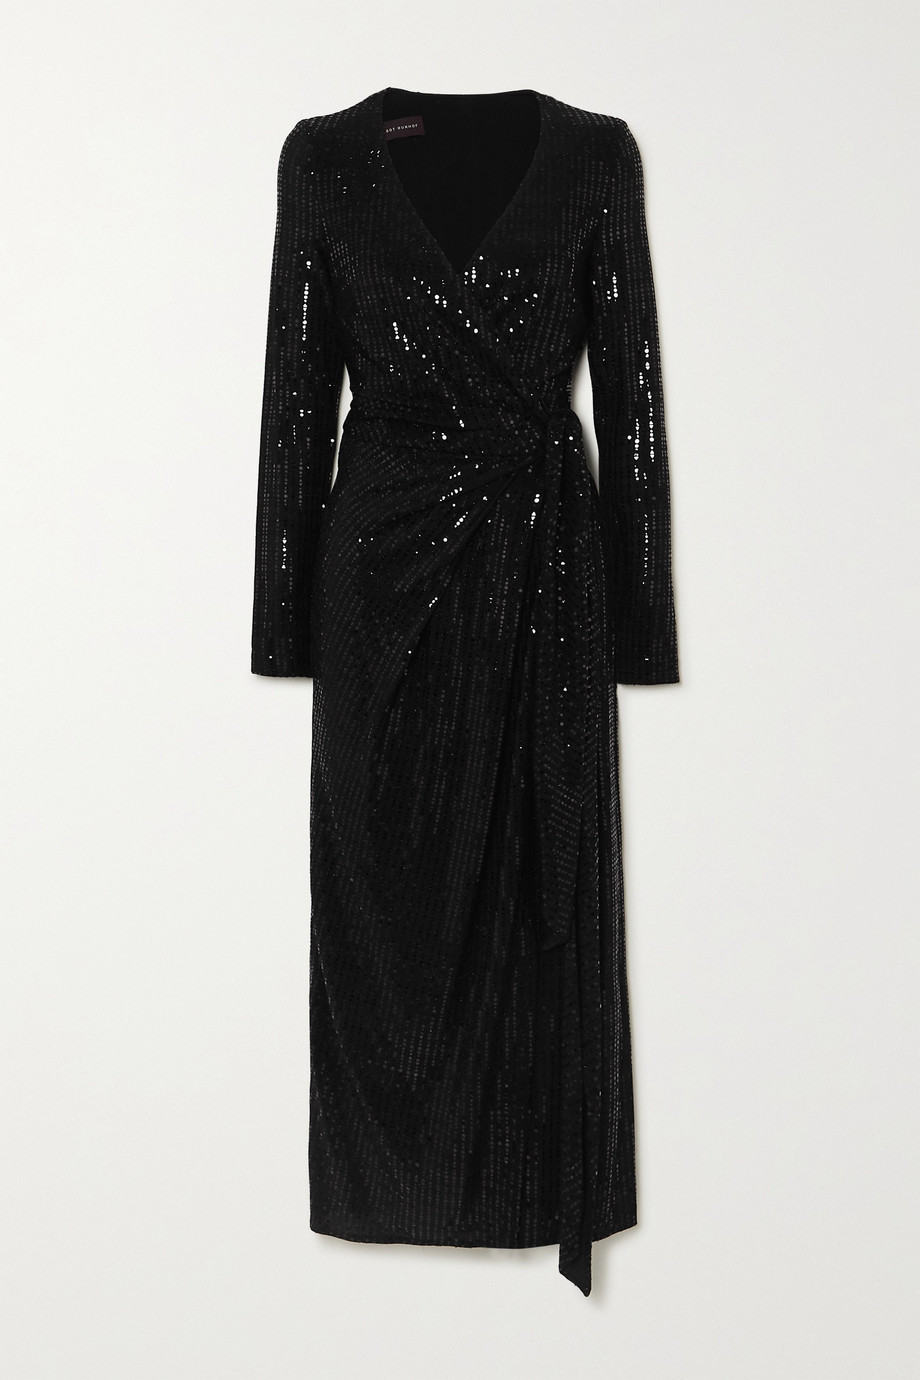 Talbot Runhof Botin 亮片金属感弹力绉纱裹身中长连衣裙